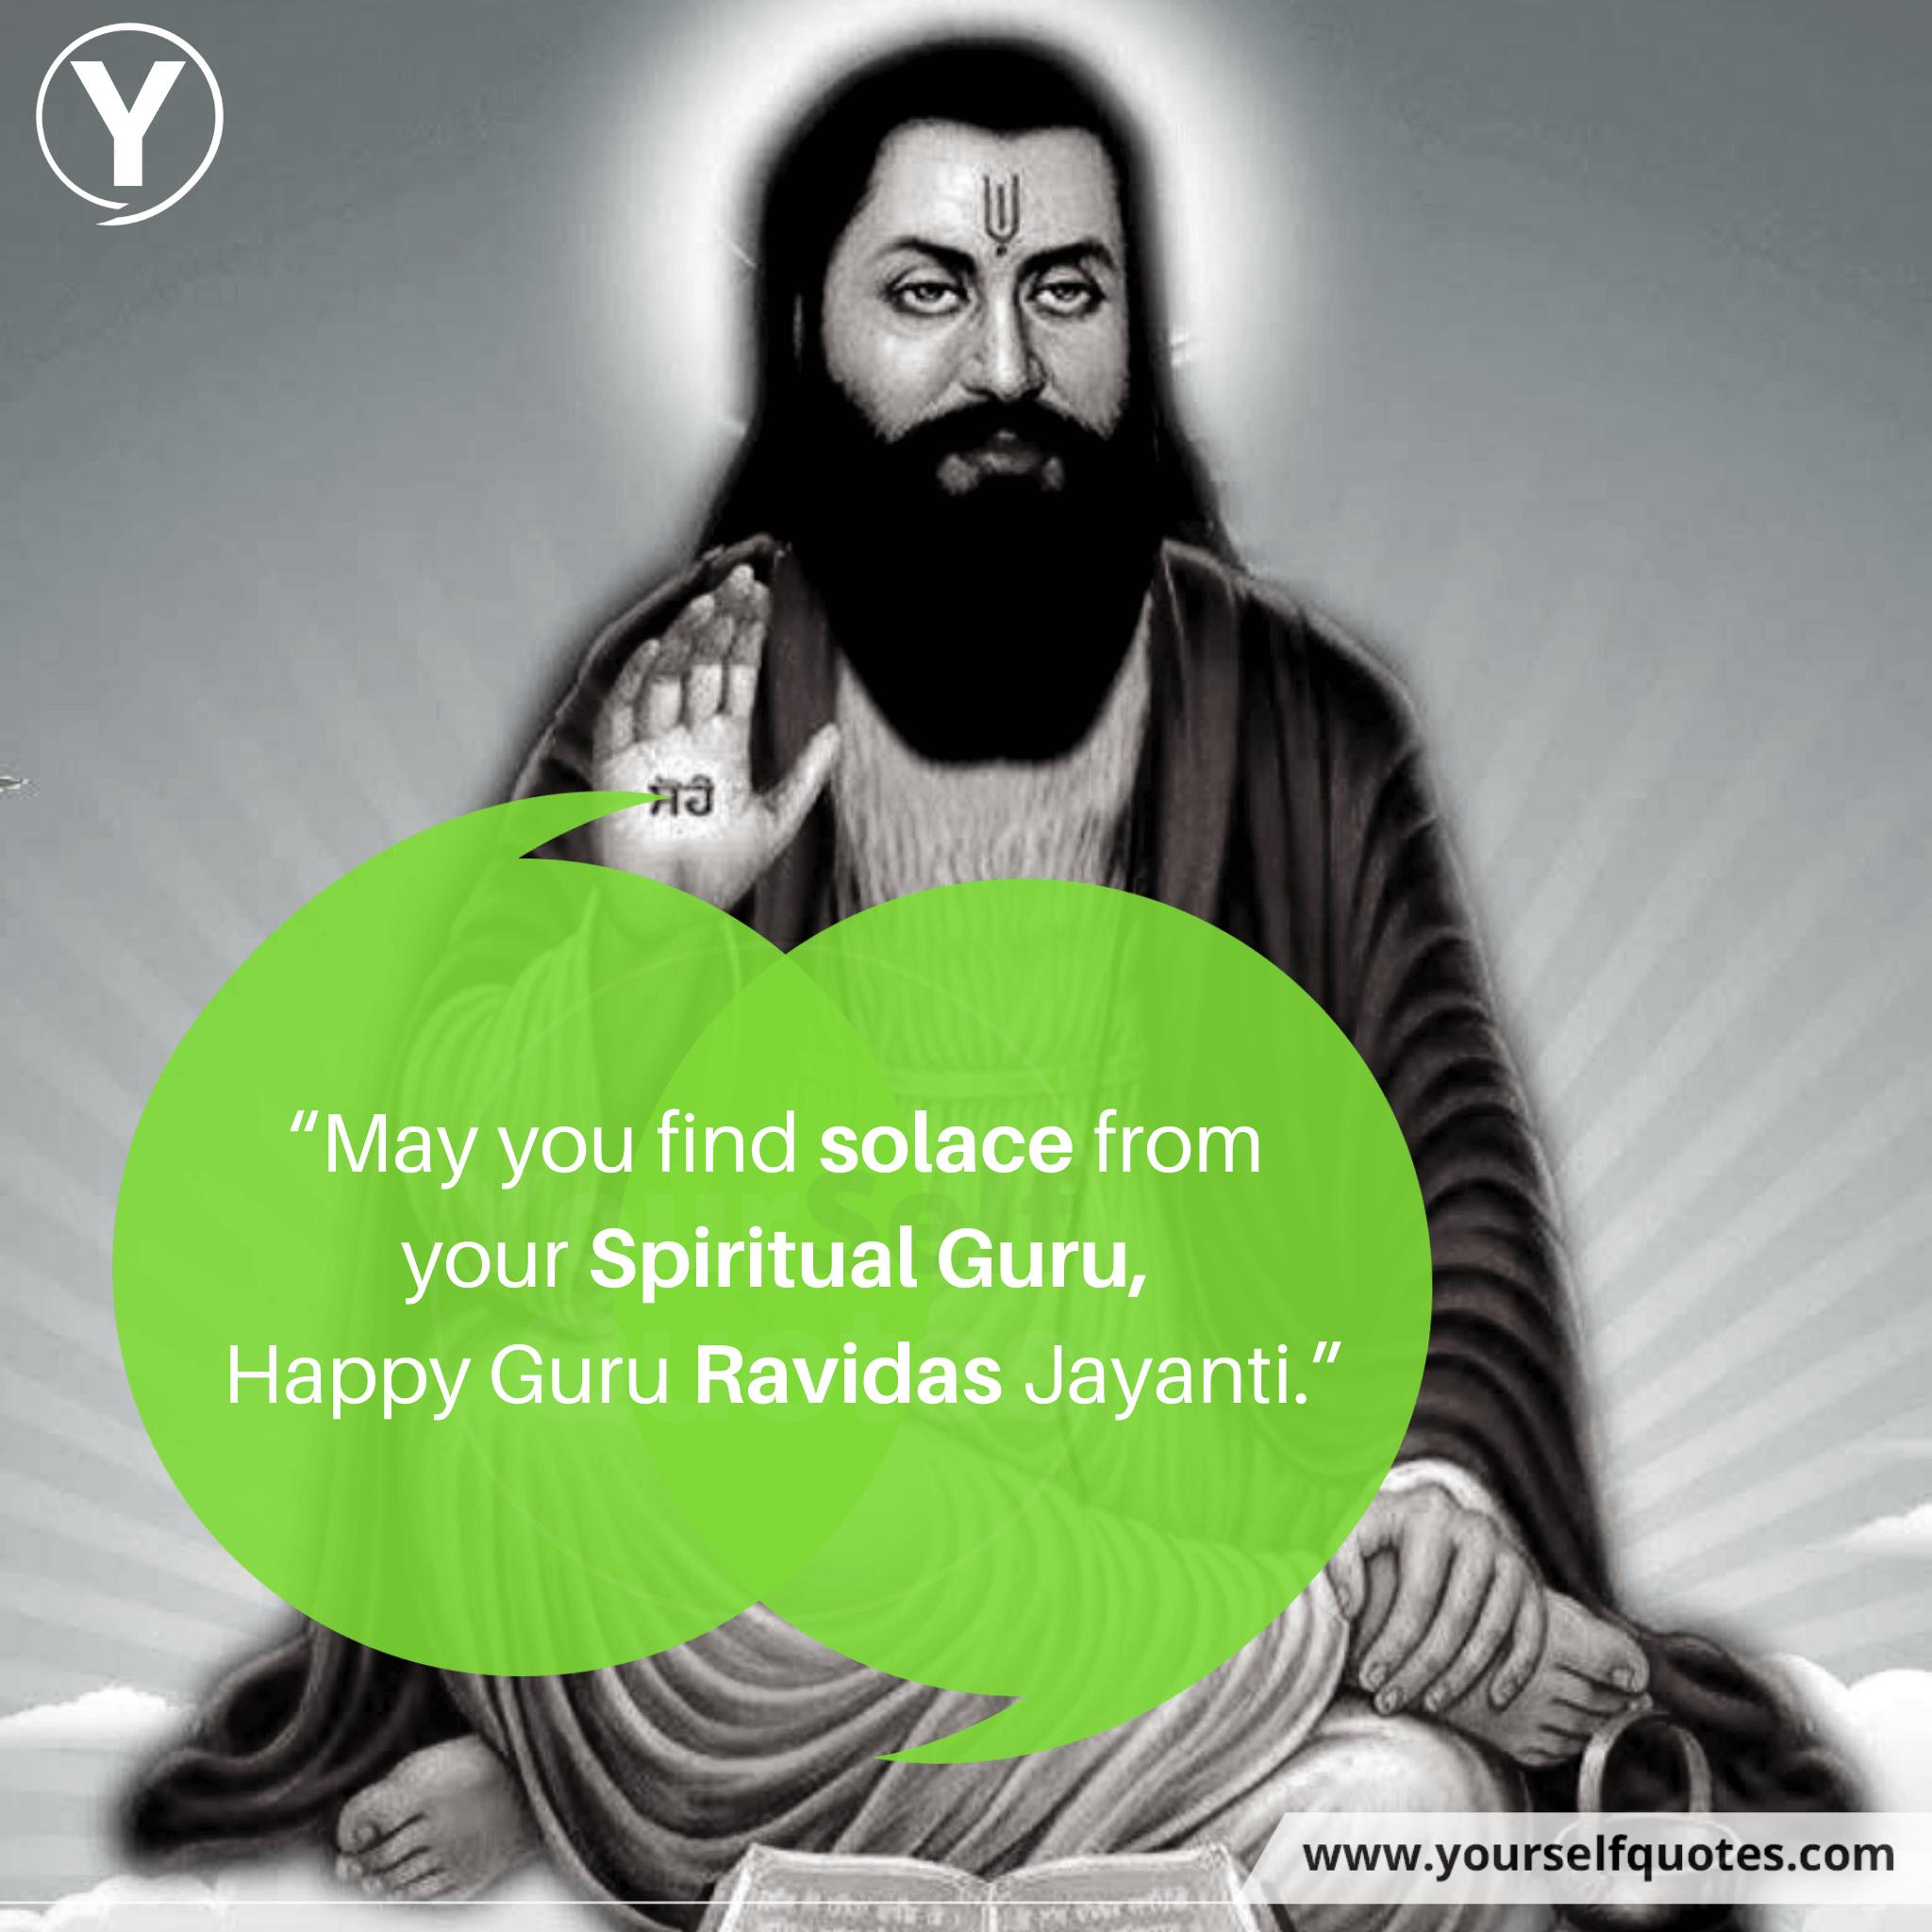 Guru Ravidas Jayanti Quotes